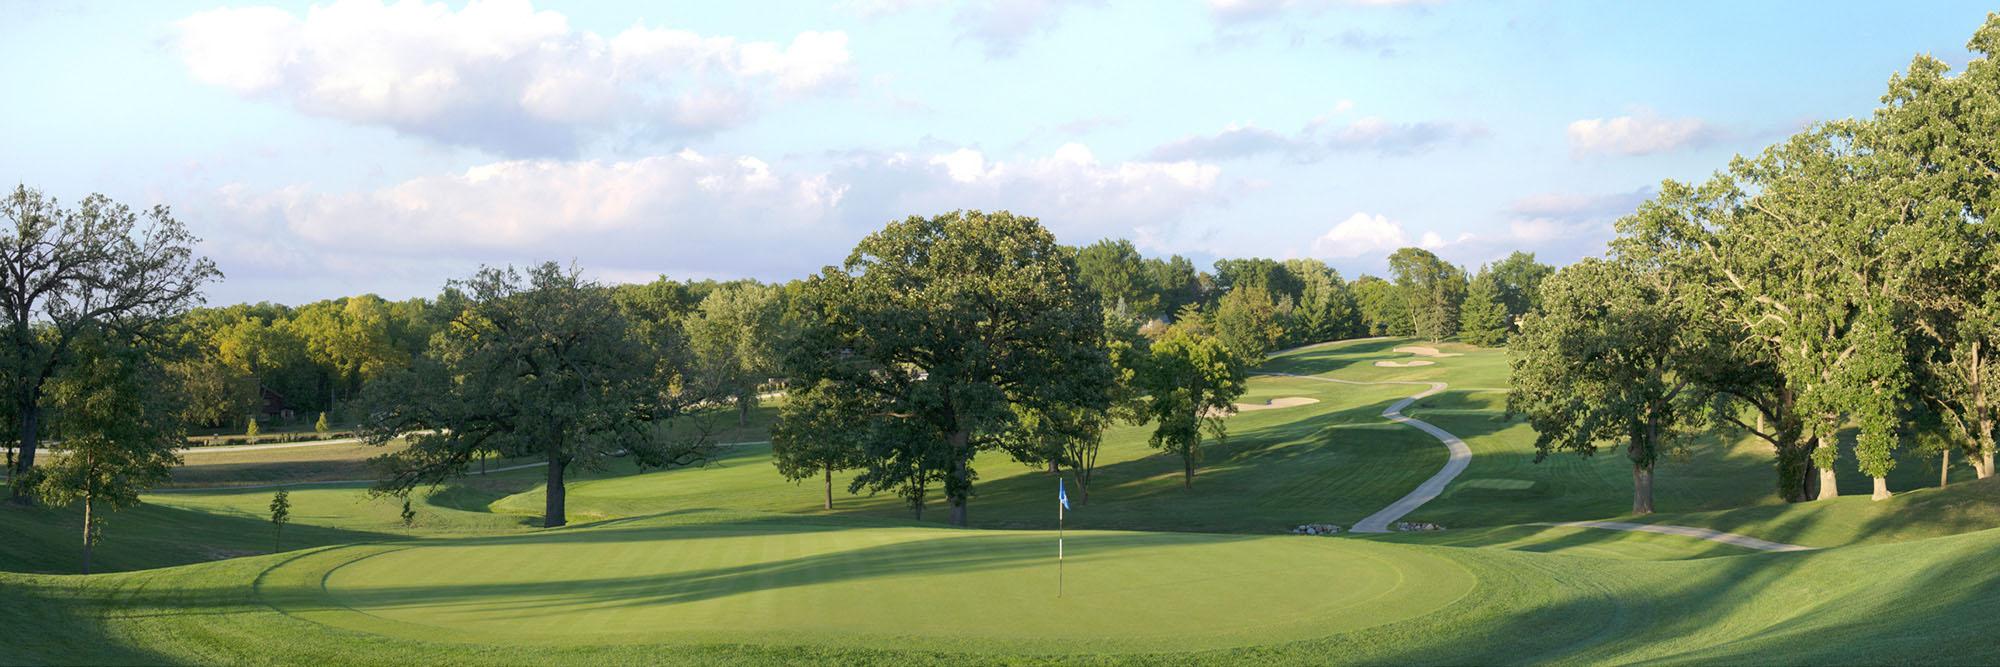 Golf Course Image - Wakonda No. 14